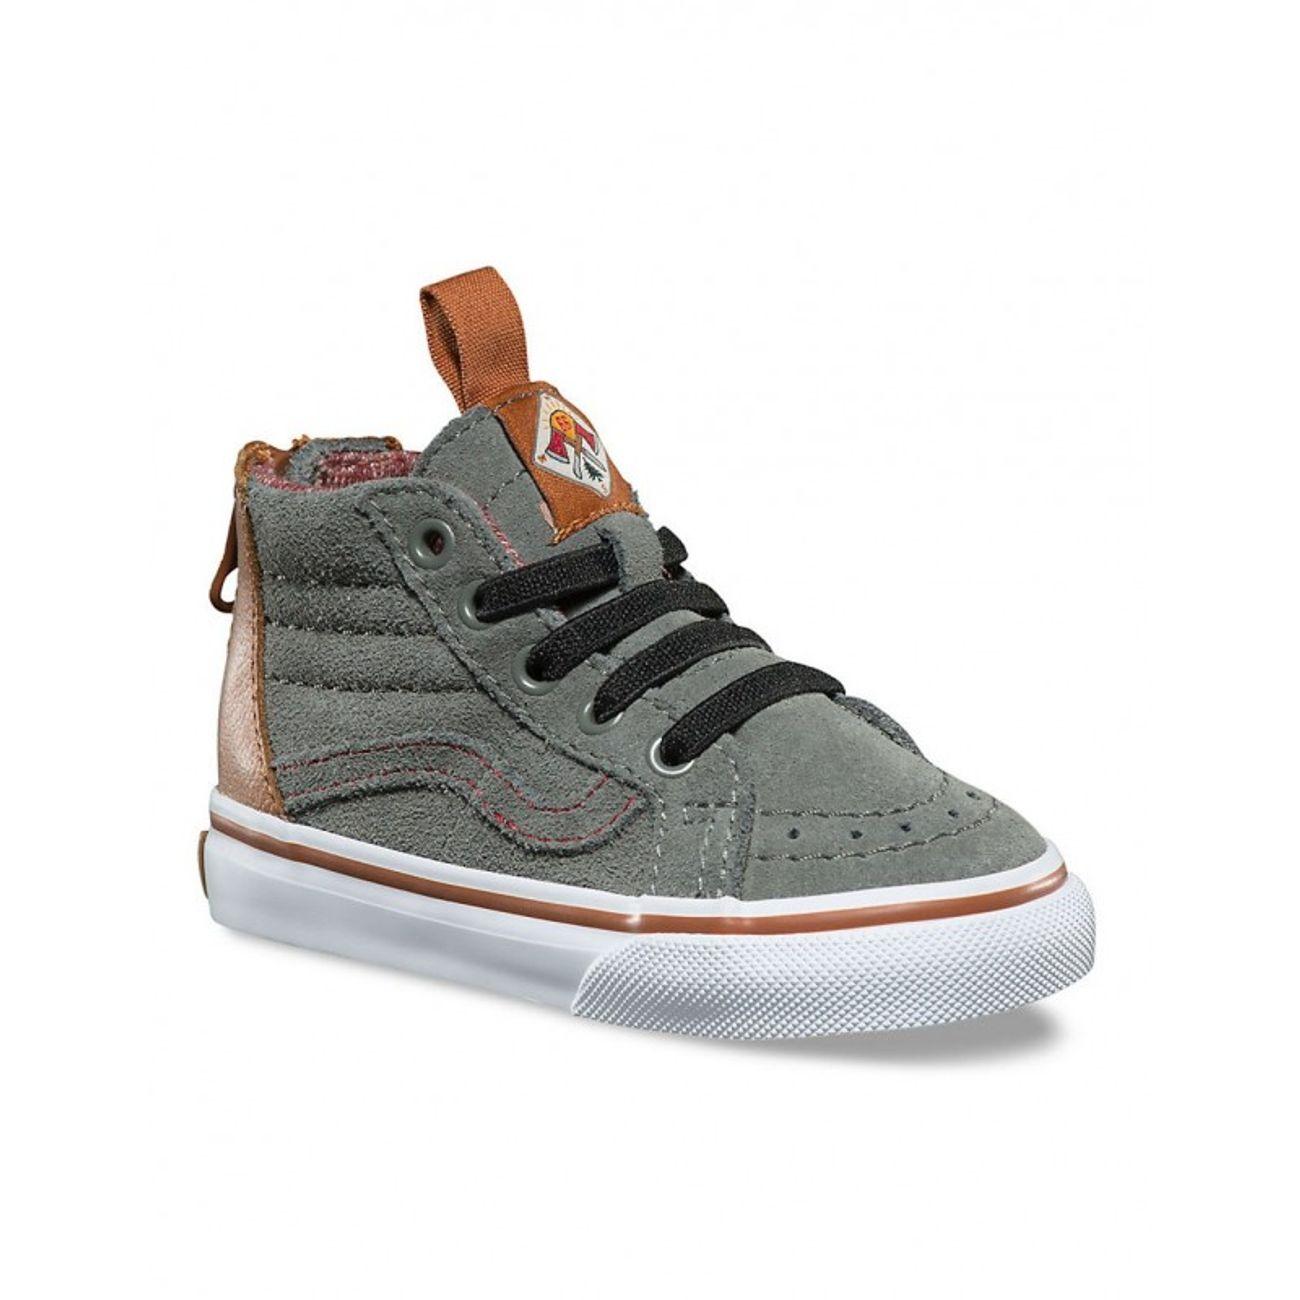 Mode- Lifestyle garçon VANS Chaussures Vans T Sk8-Hi Zip Mte - Castor Grey